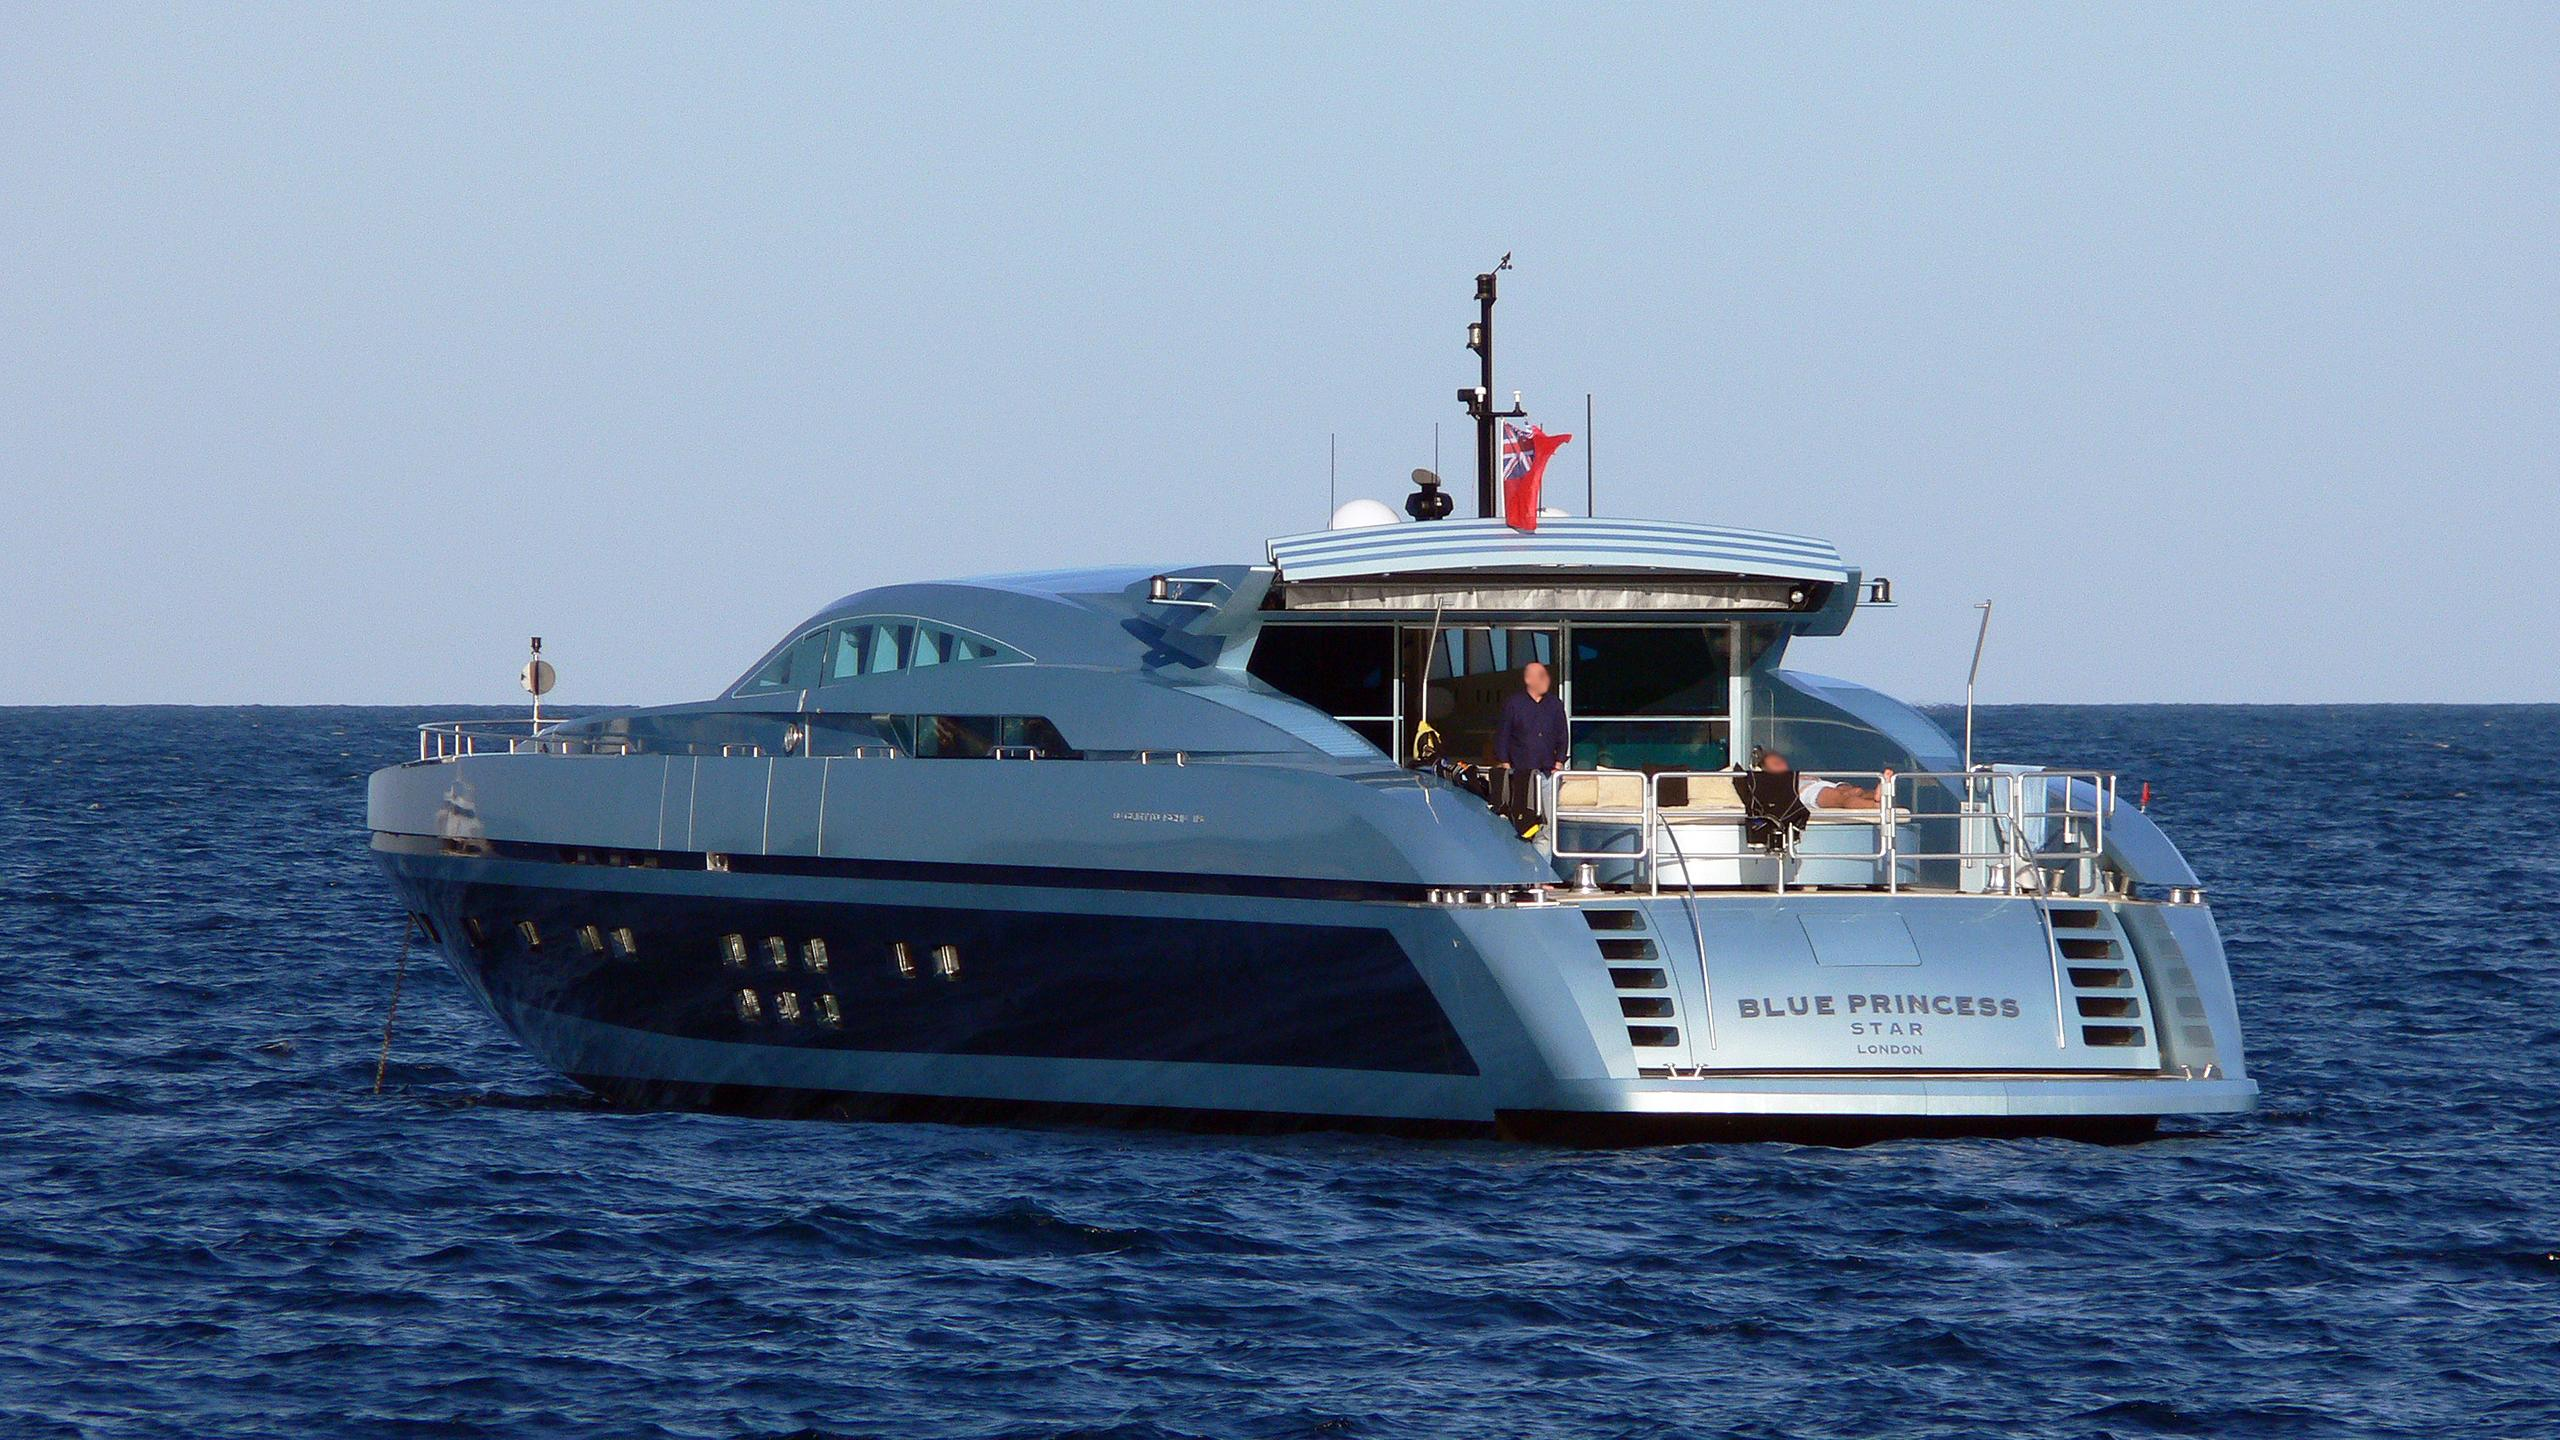 blue-princess-star-motor-yacht-baglietto-112-ht-2005-34m-stern